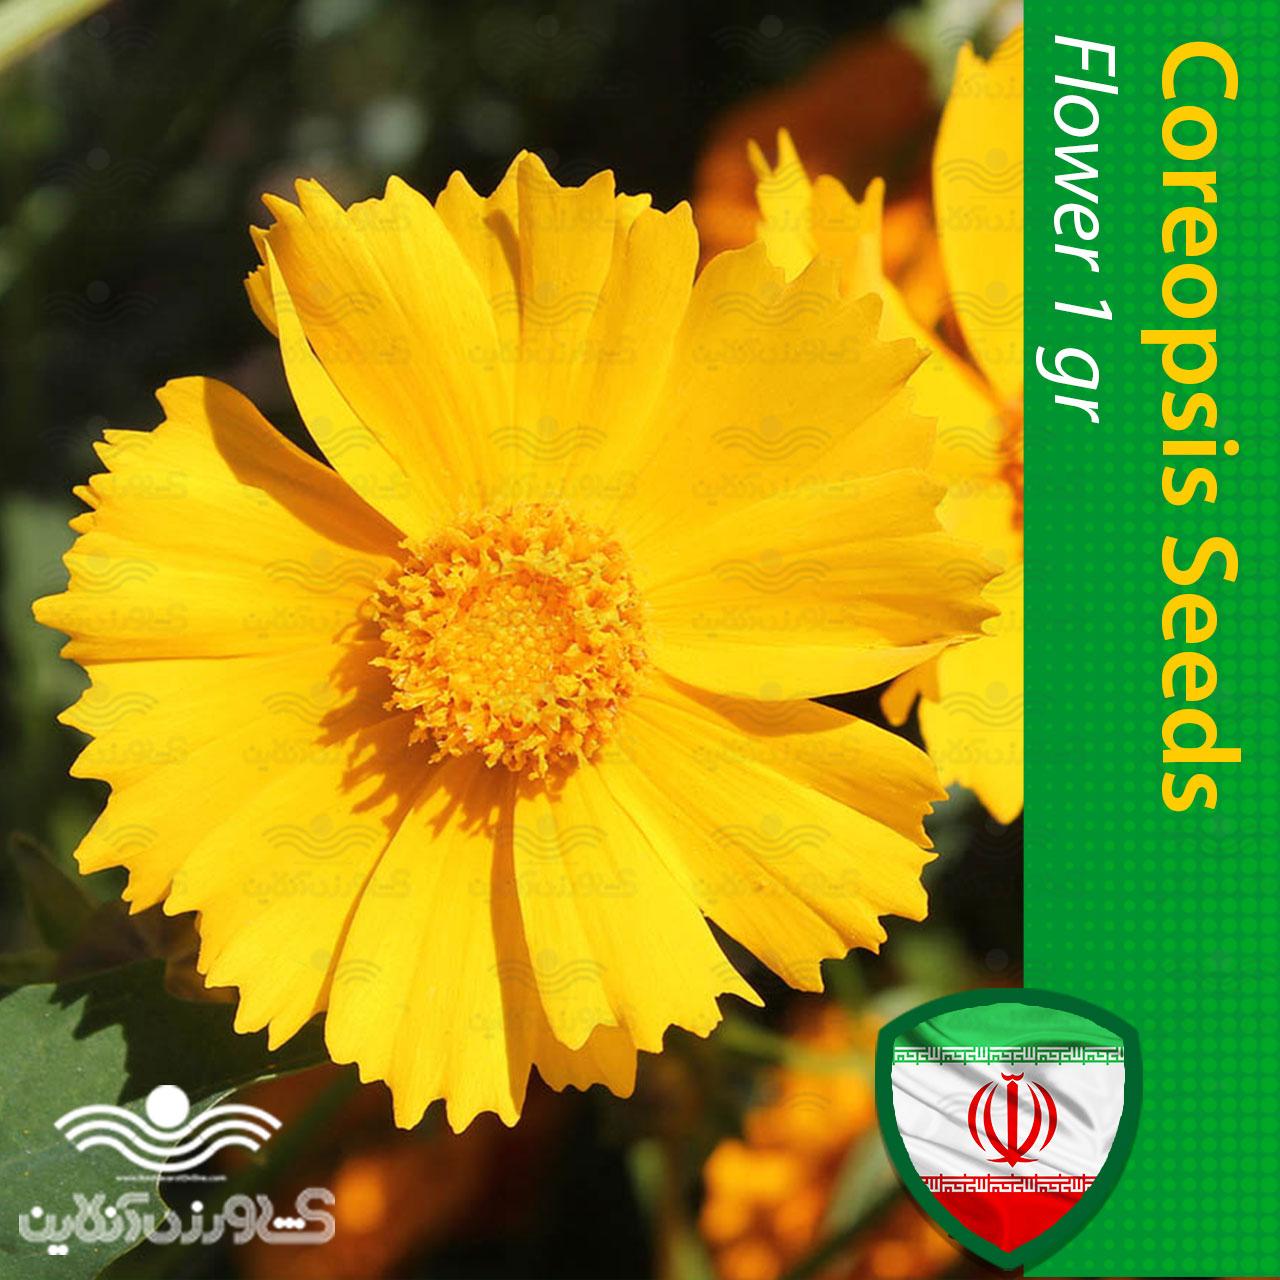 بذر گل کوریوپسیس اشرفی زرد و روش کاشت